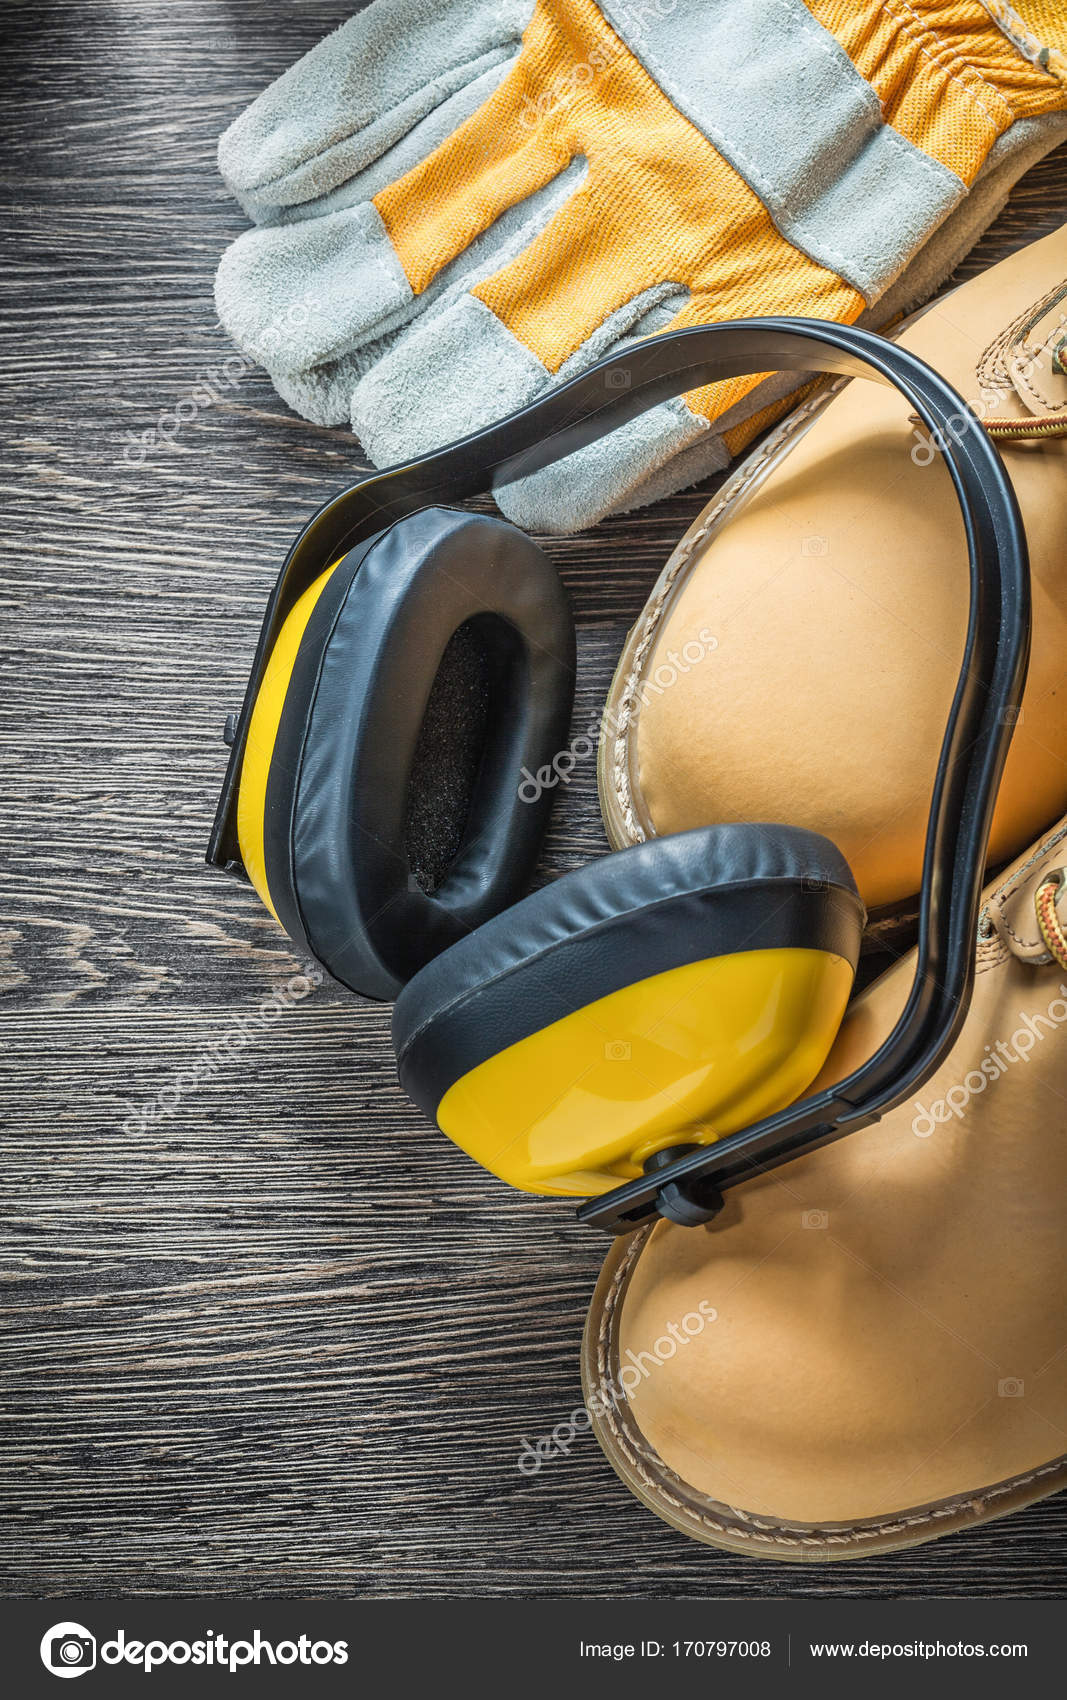 e3eeabc49b6 Προστατευτικά γάντια αδιάβροχα εργασίας ωτοασπίδες μπότες για ξύλινη σανίδα  — Εικόνα από ...